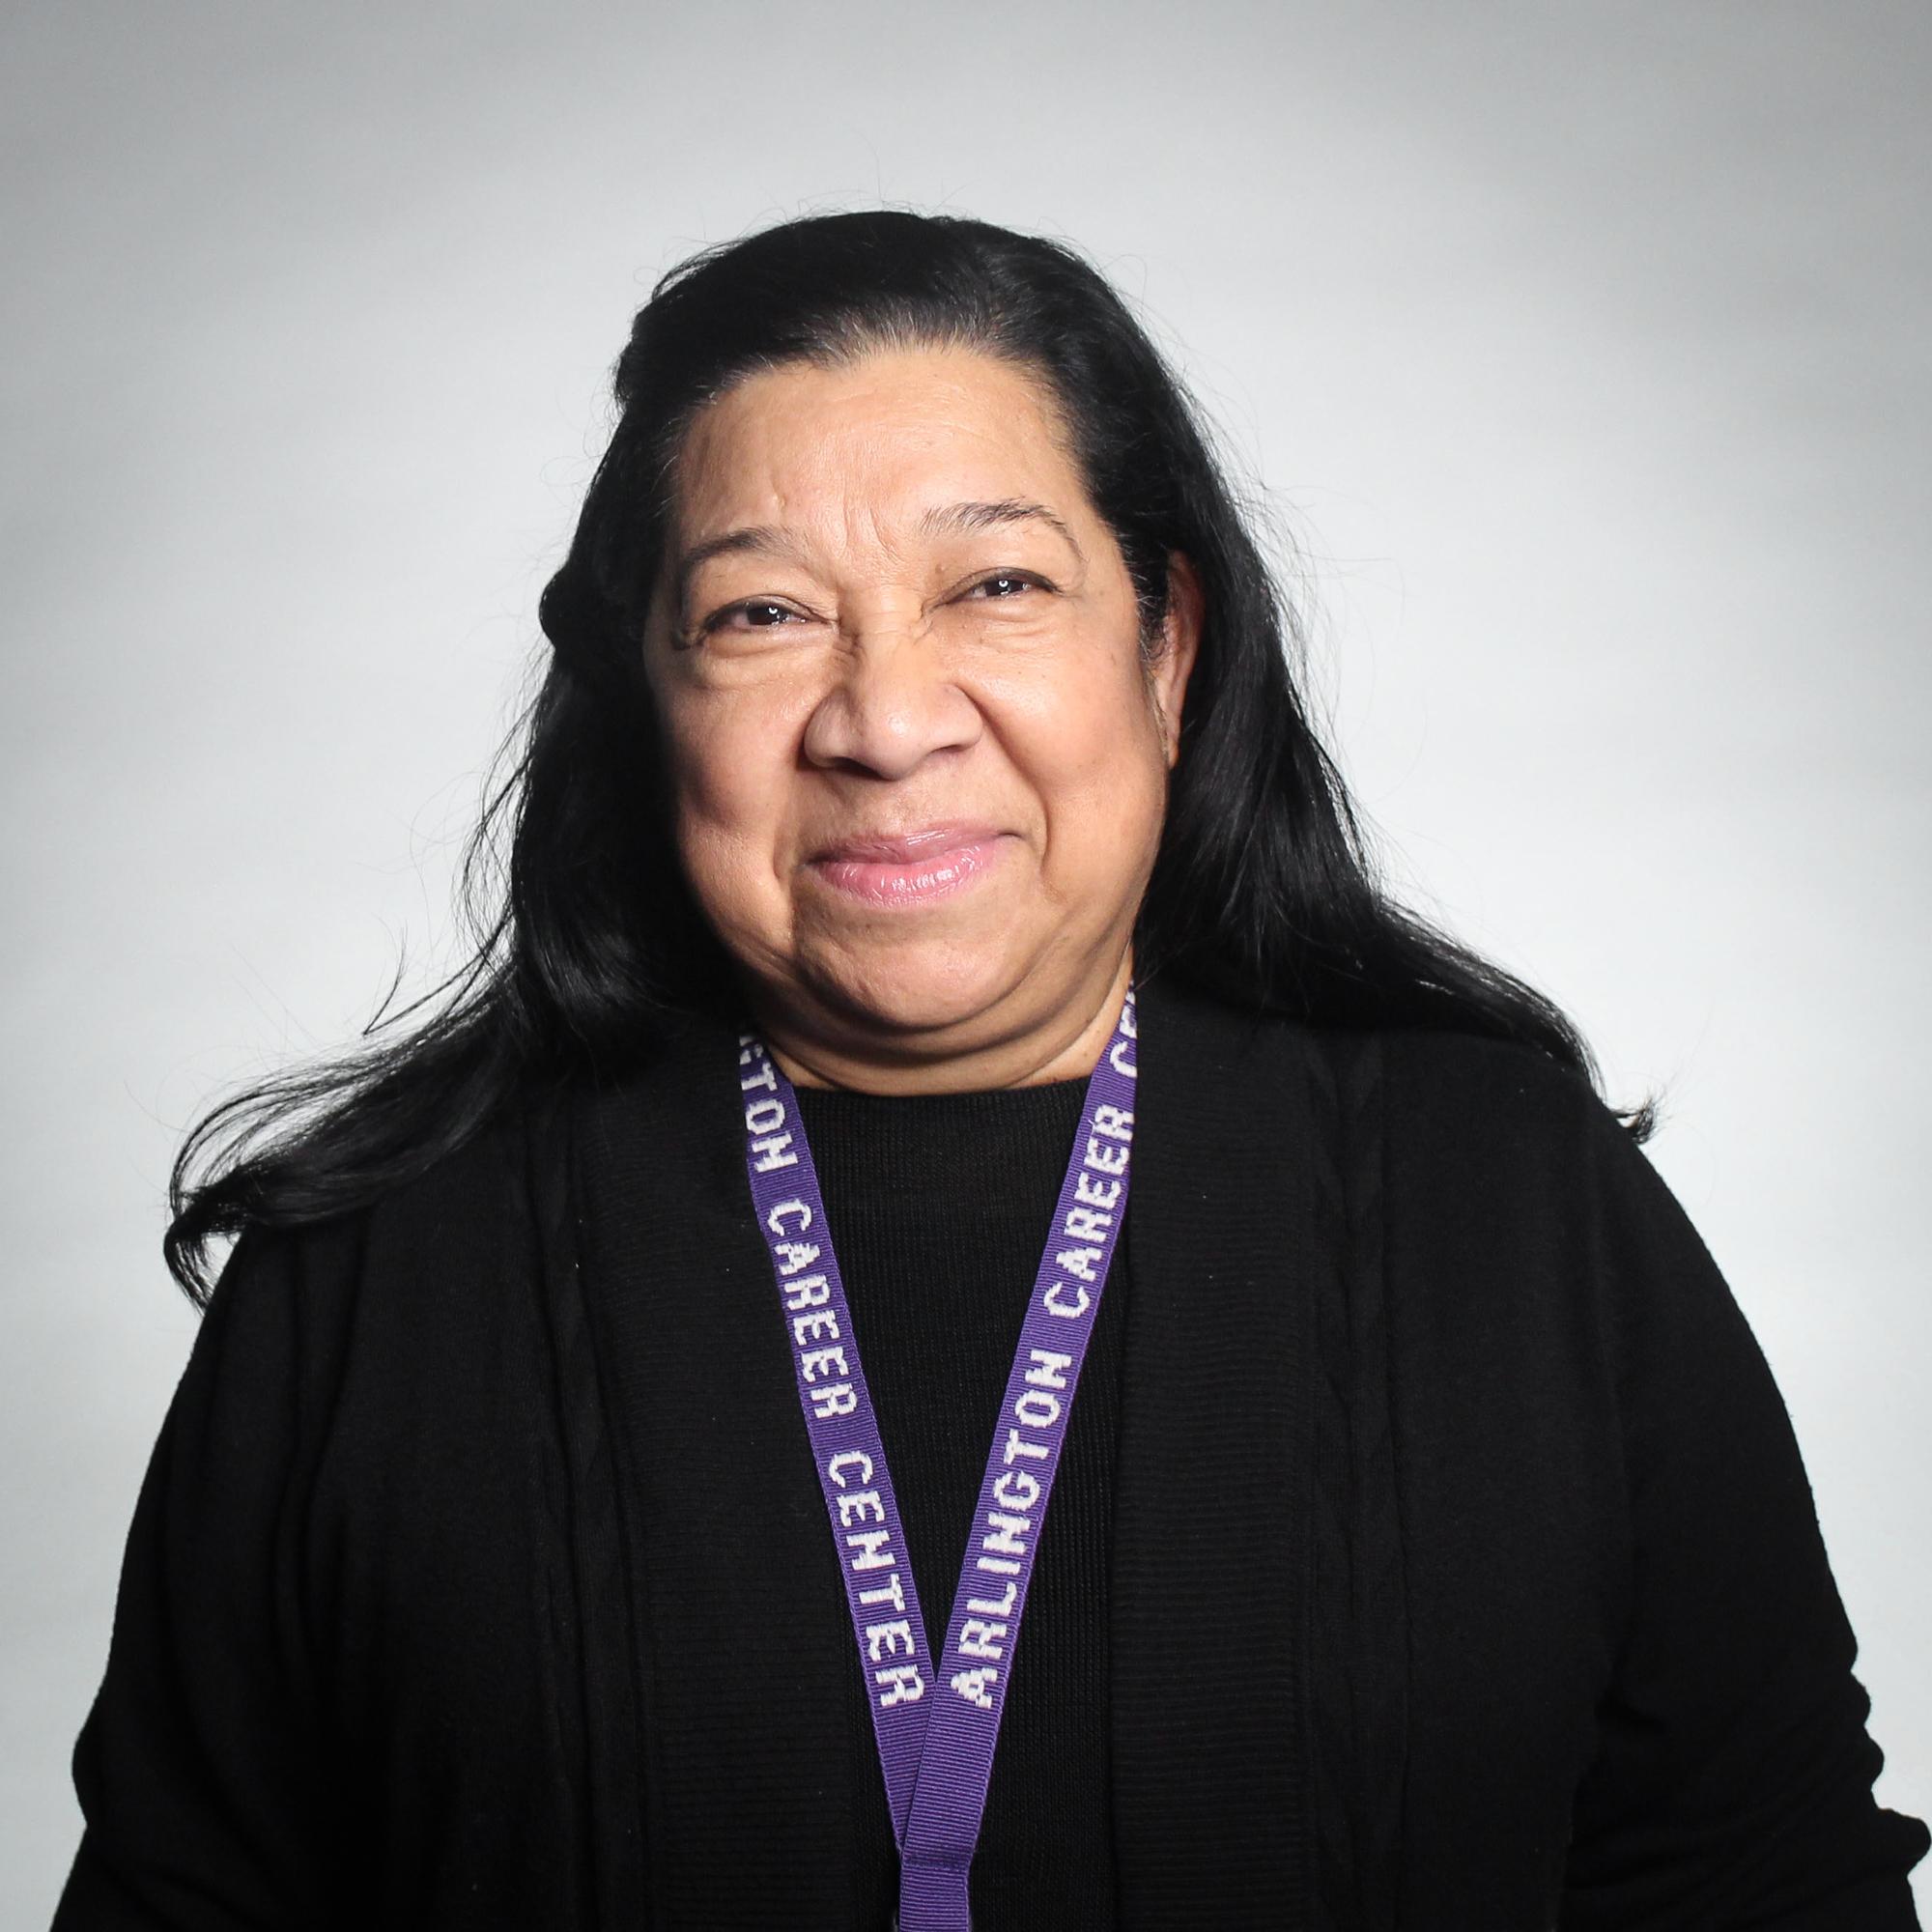 Ms. Melida Reyes